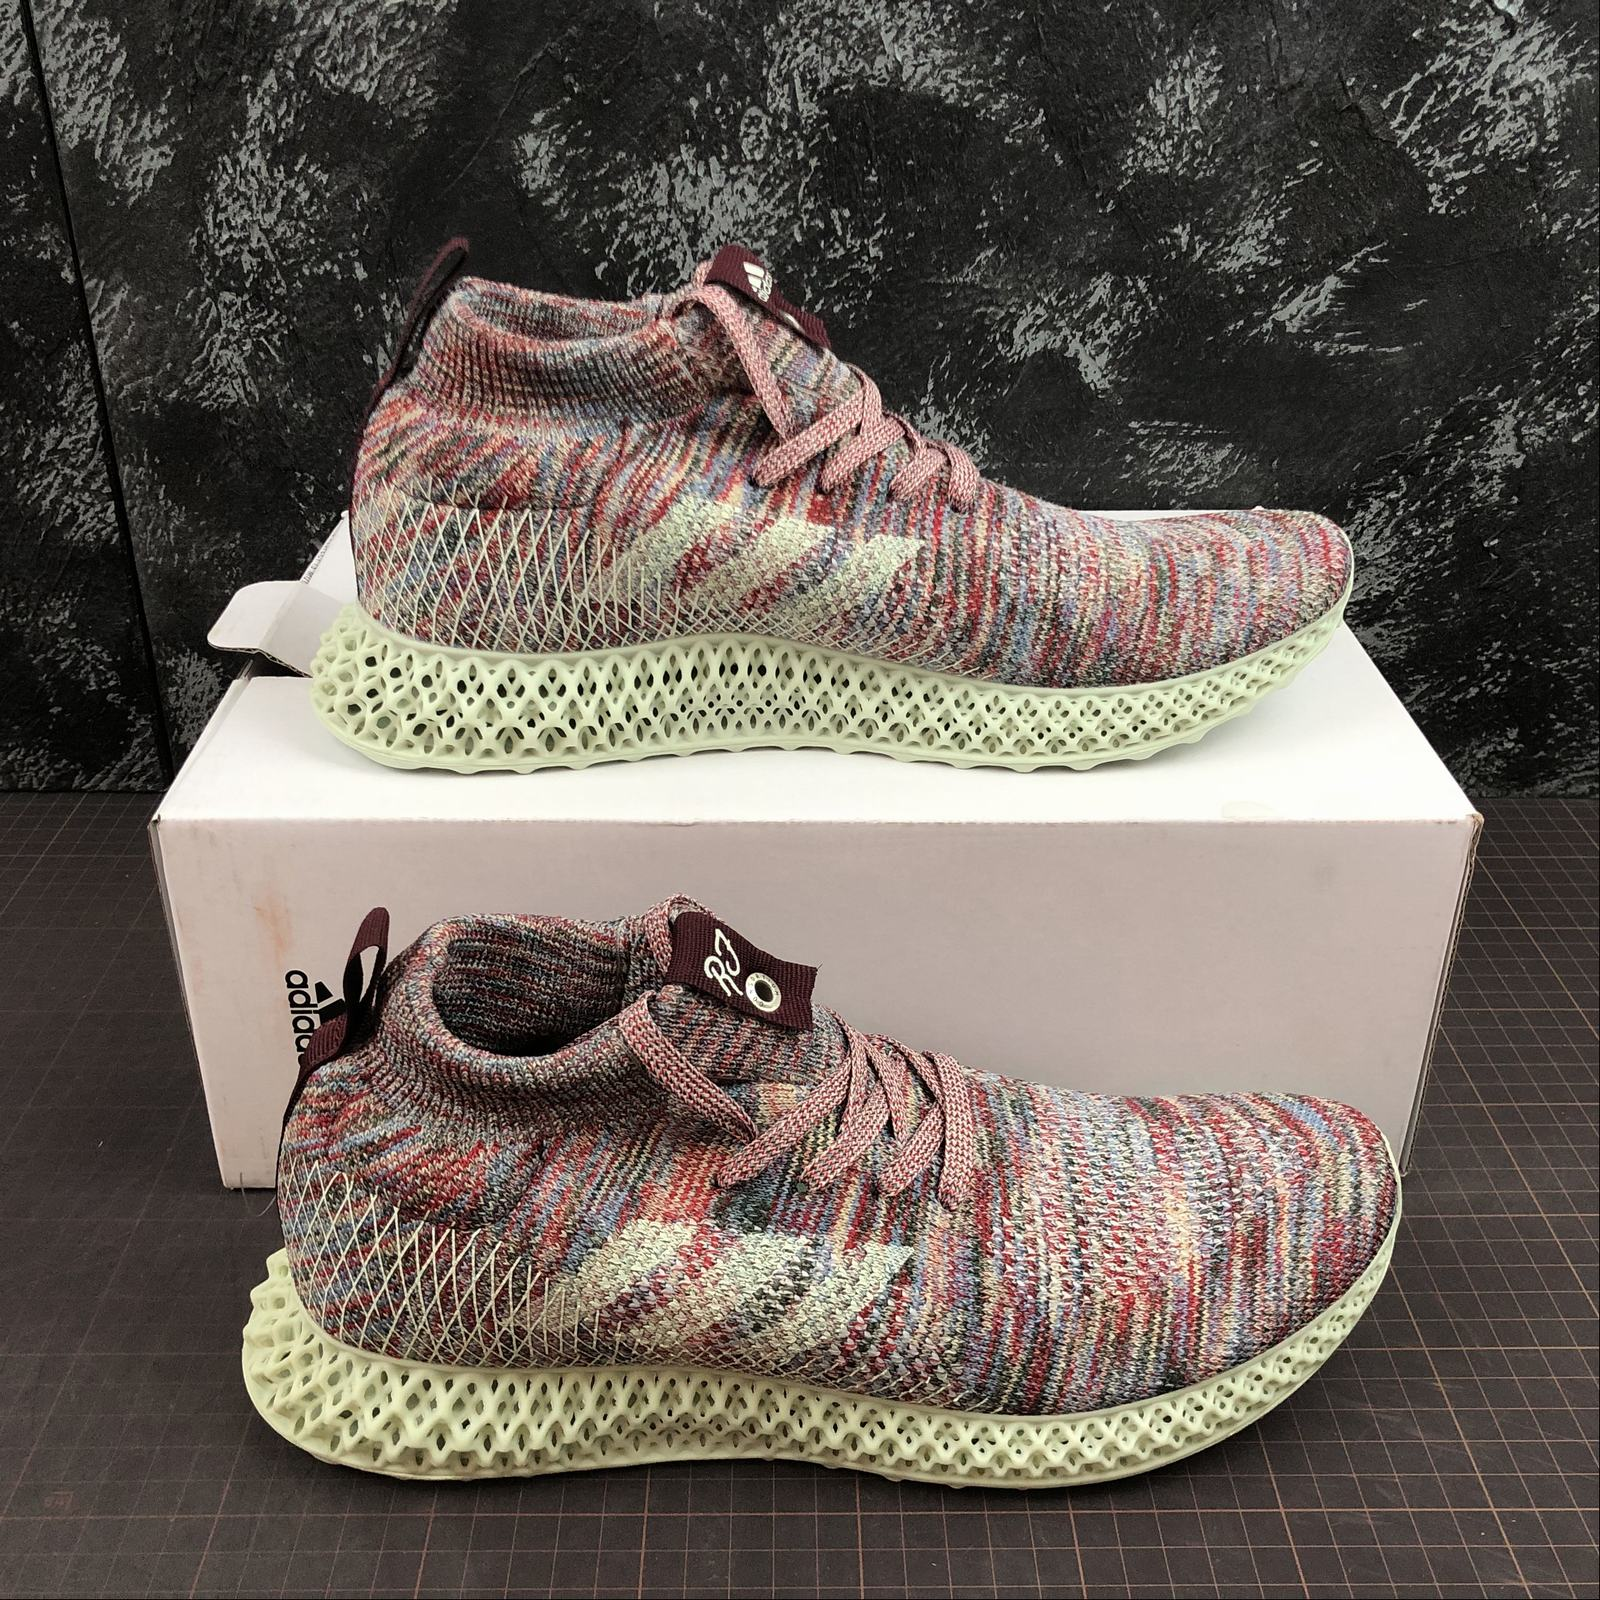 giay-sneaker-adidas-consortium-runner-kith-4d-bb9533